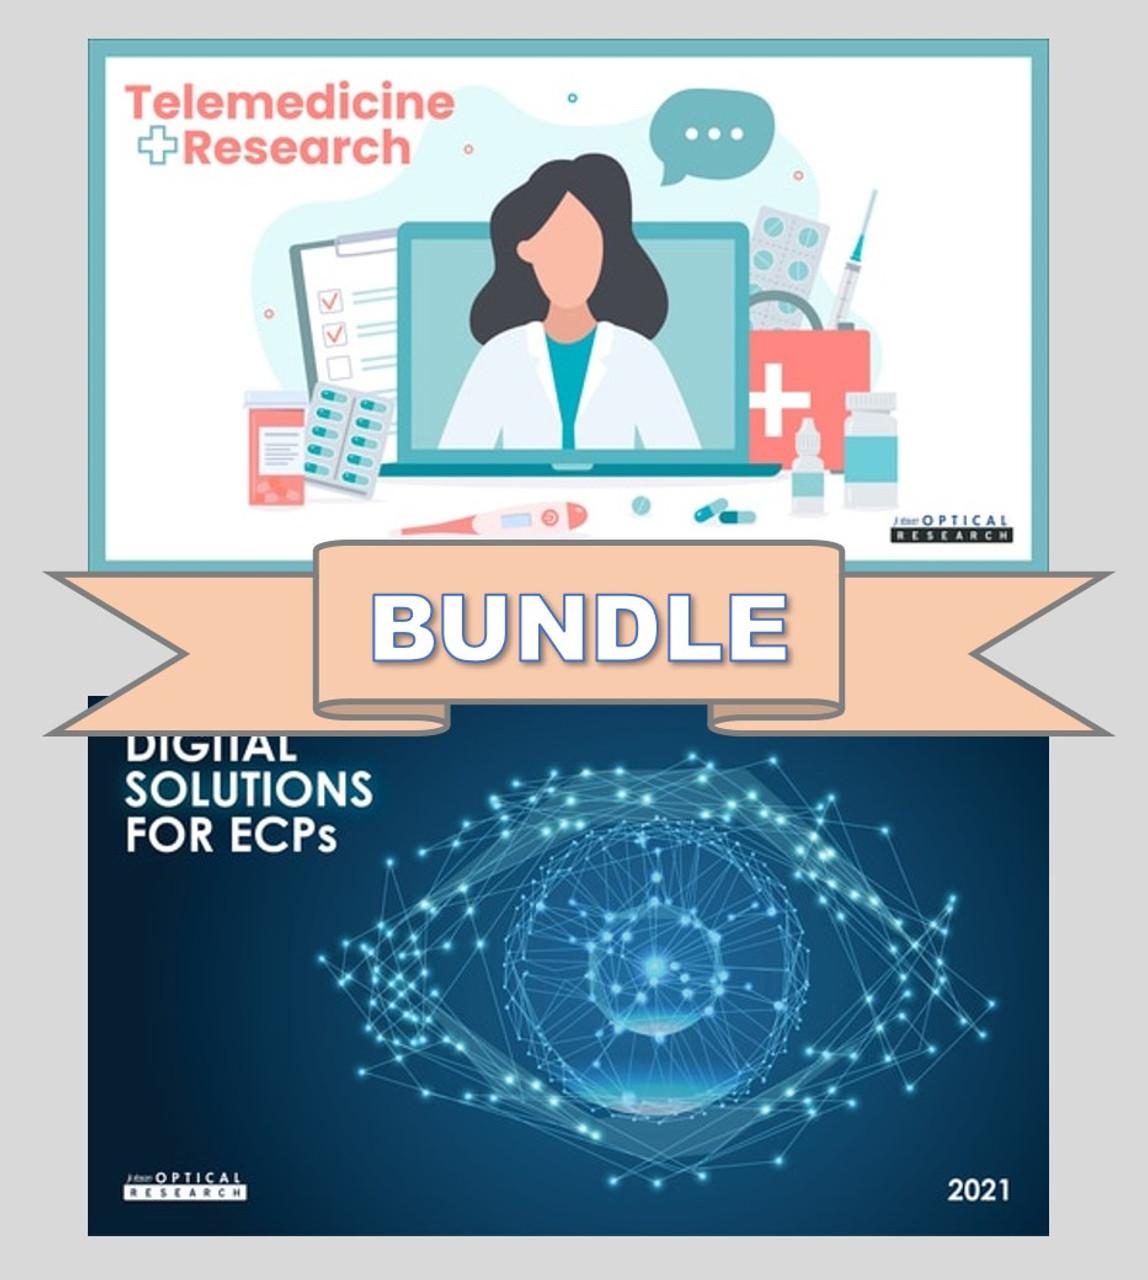 Technology Research Bundle